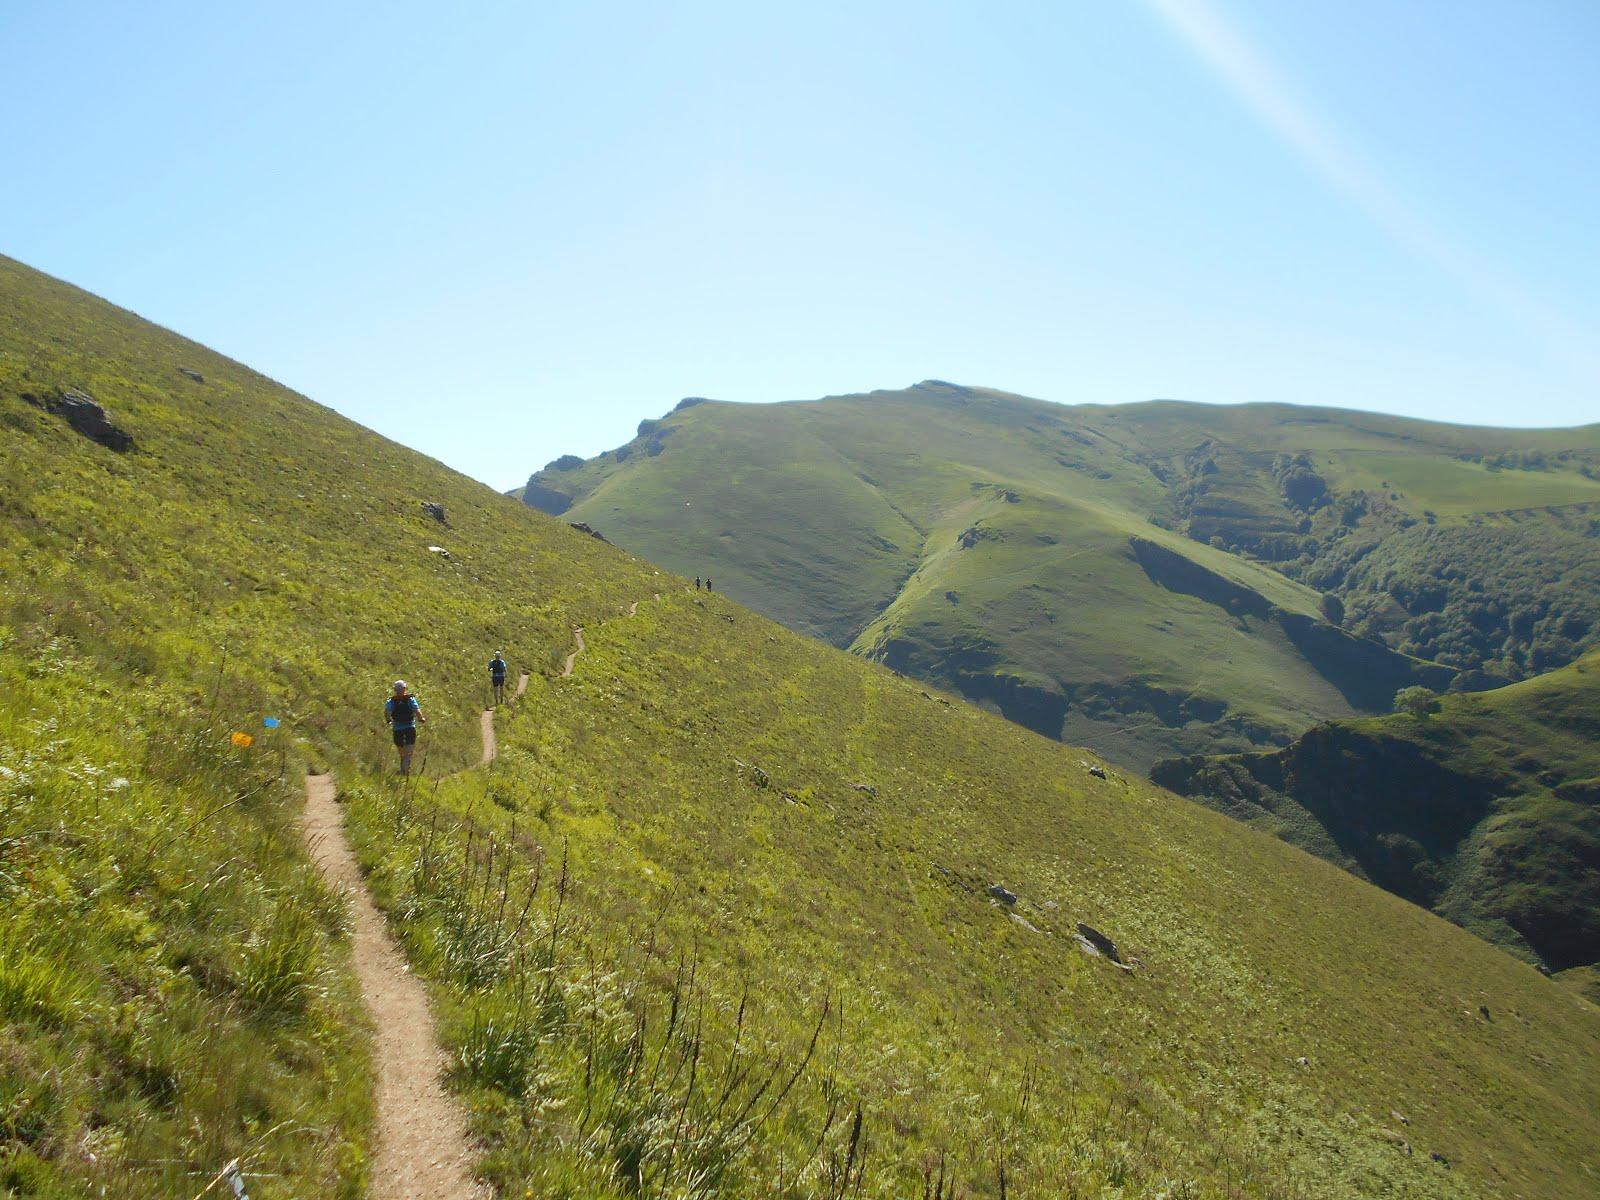 Euskal trails 2019. Trail gourmand